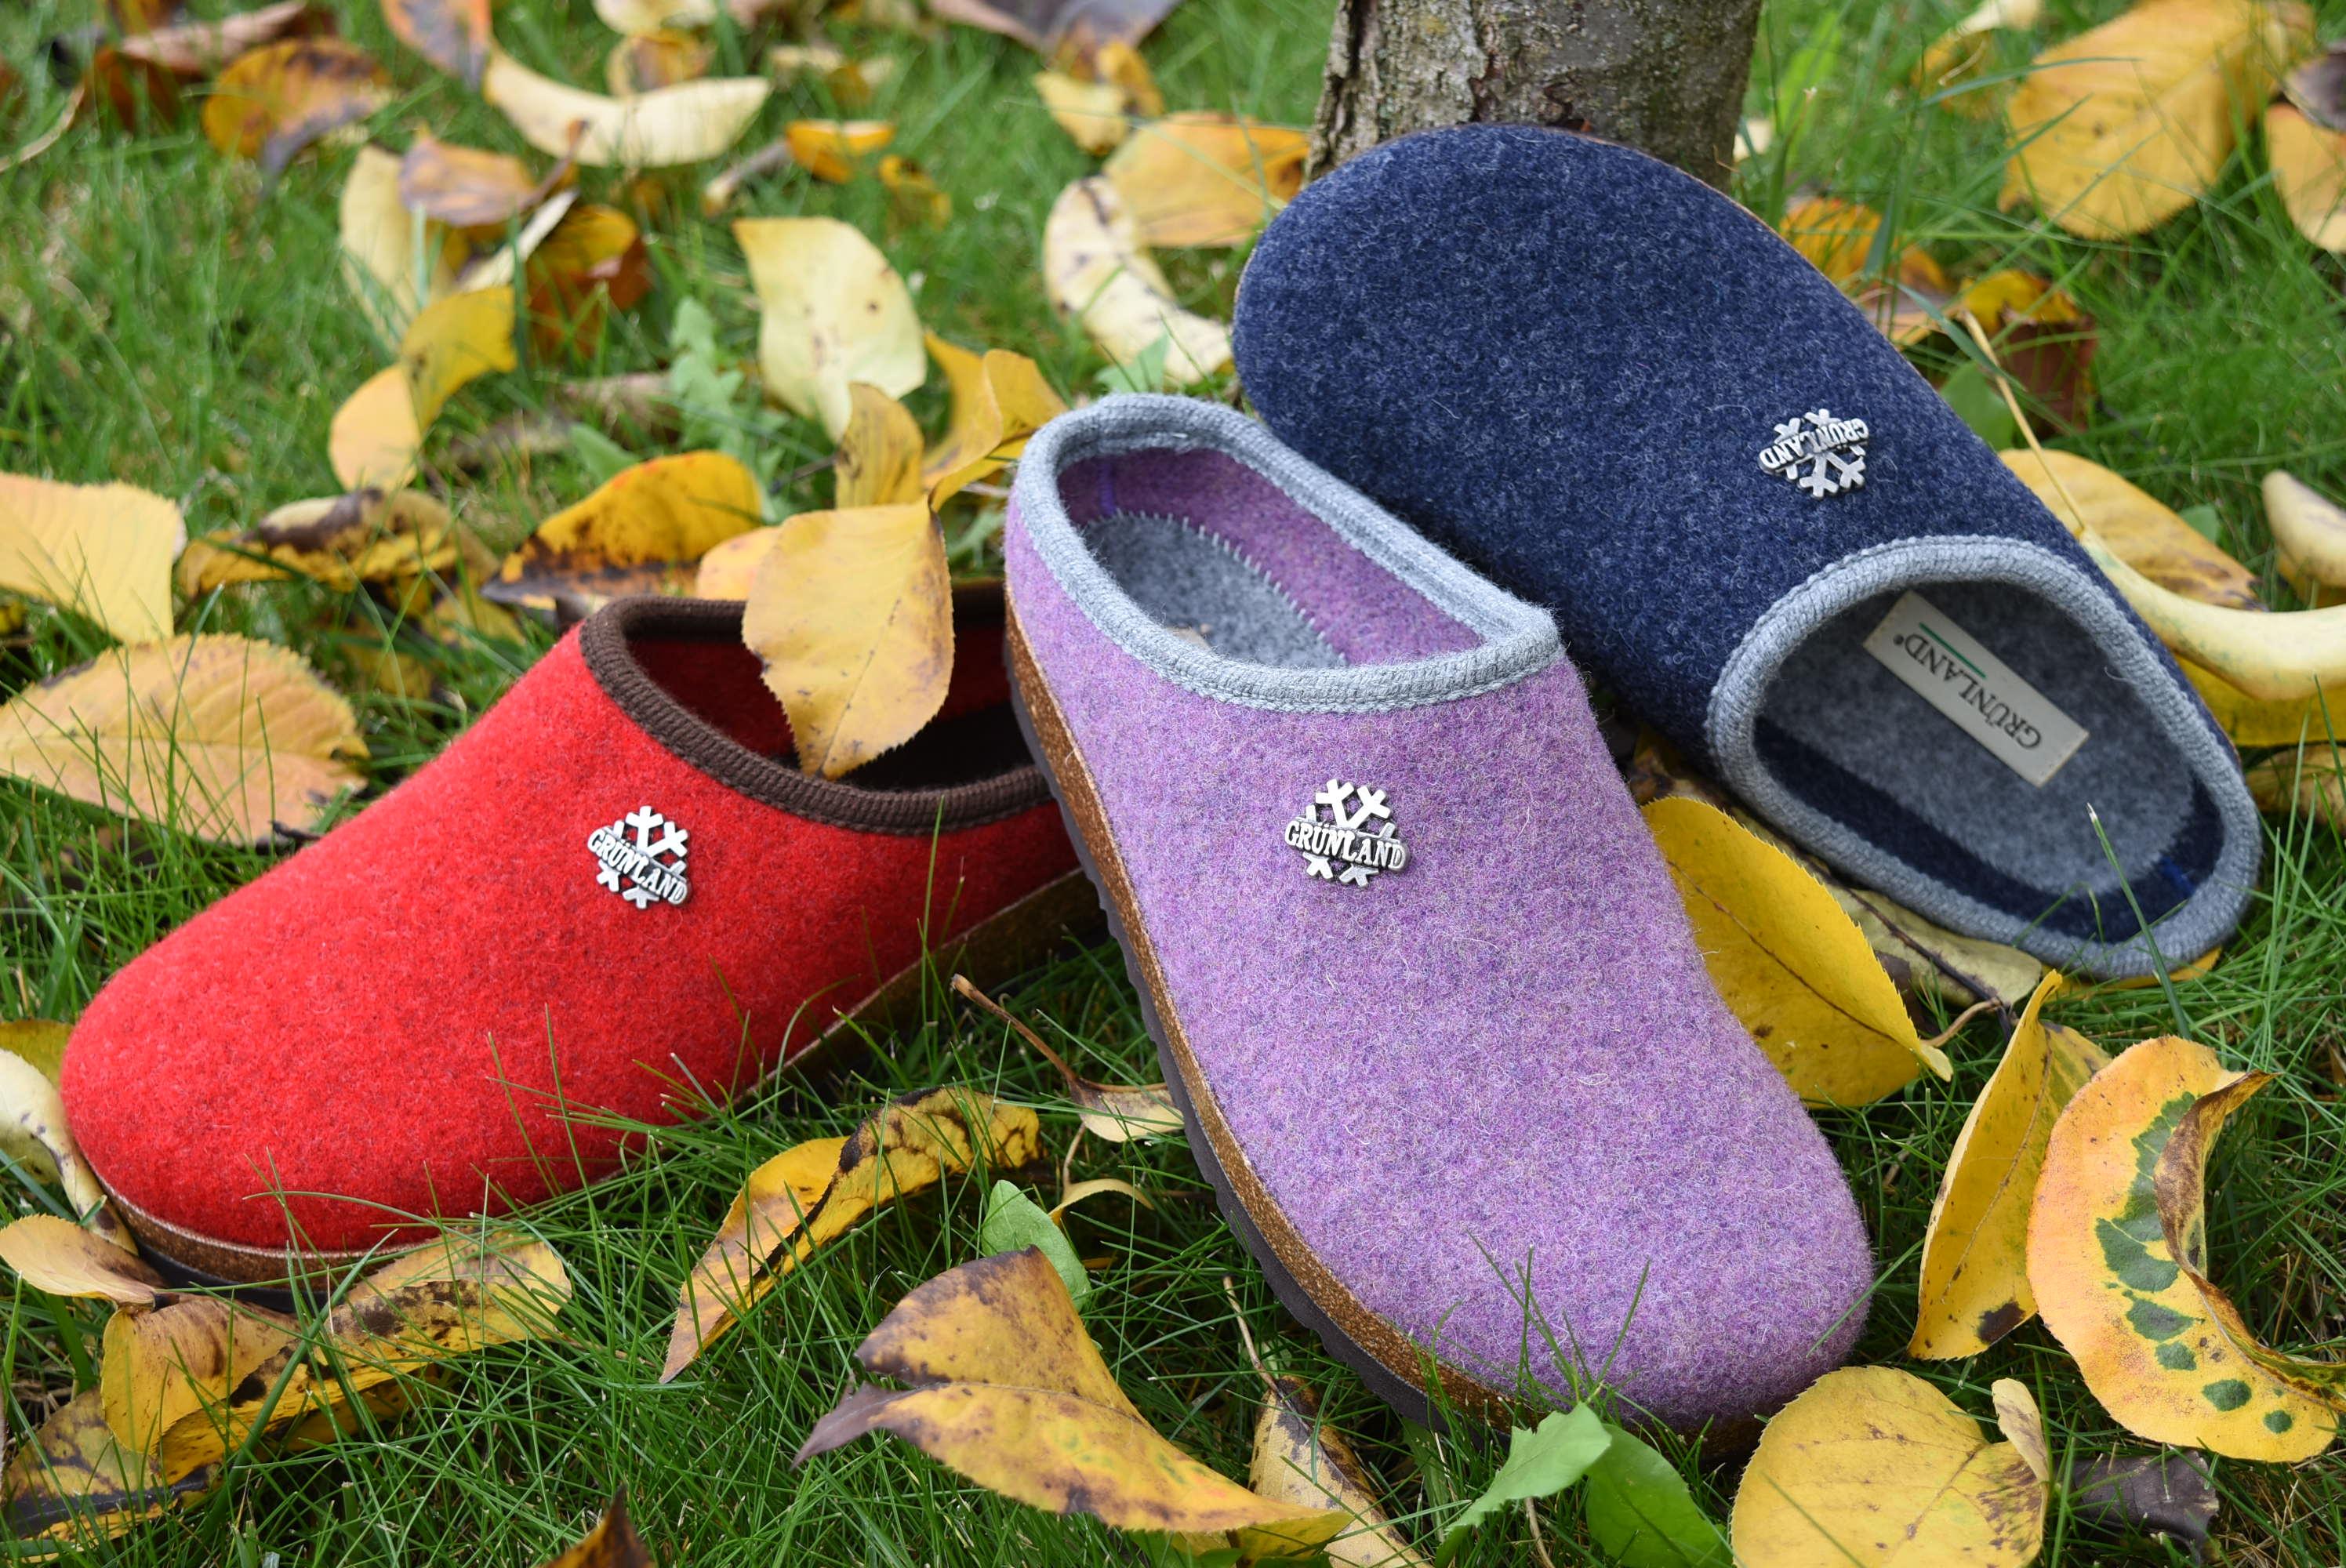 GRUNLAND CB0169 11 Ciabatte Pantofole Tirolese Donna Lana Cotta Feltro Tirolesi